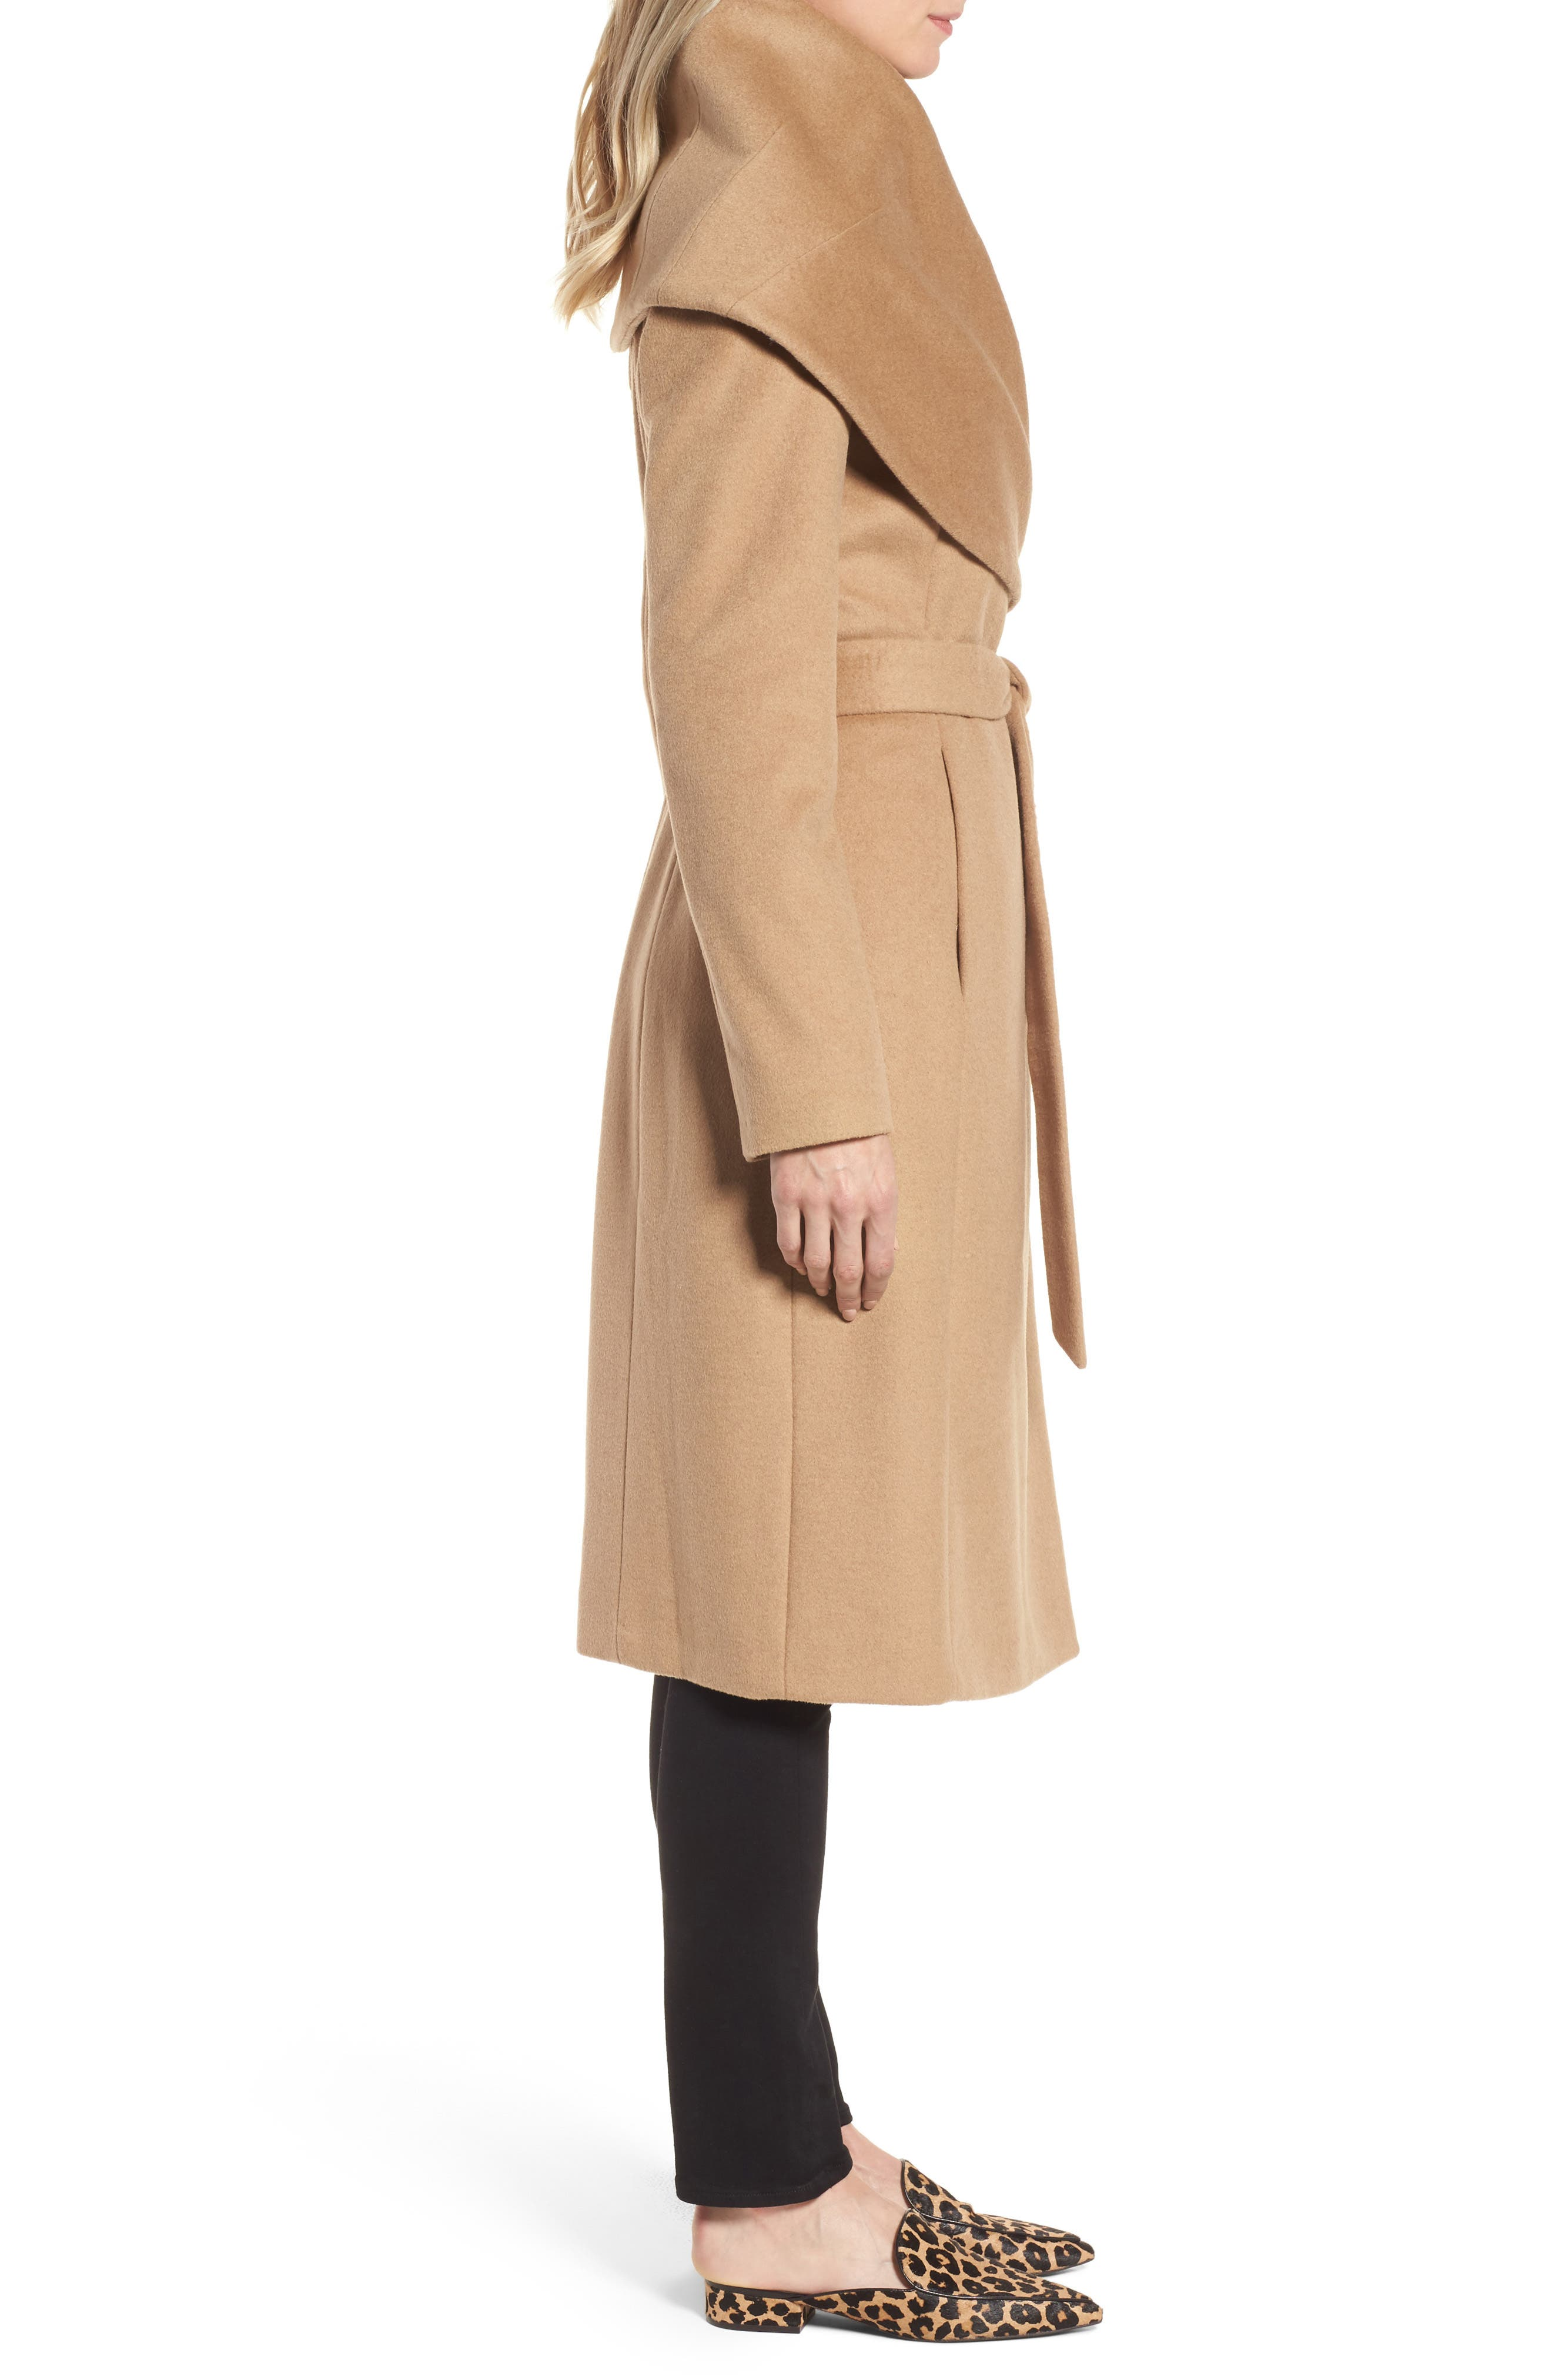 DKNY Wool Blend Shawl Collar Wrap Coat,                             Alternate thumbnail 3, color,                             Camel